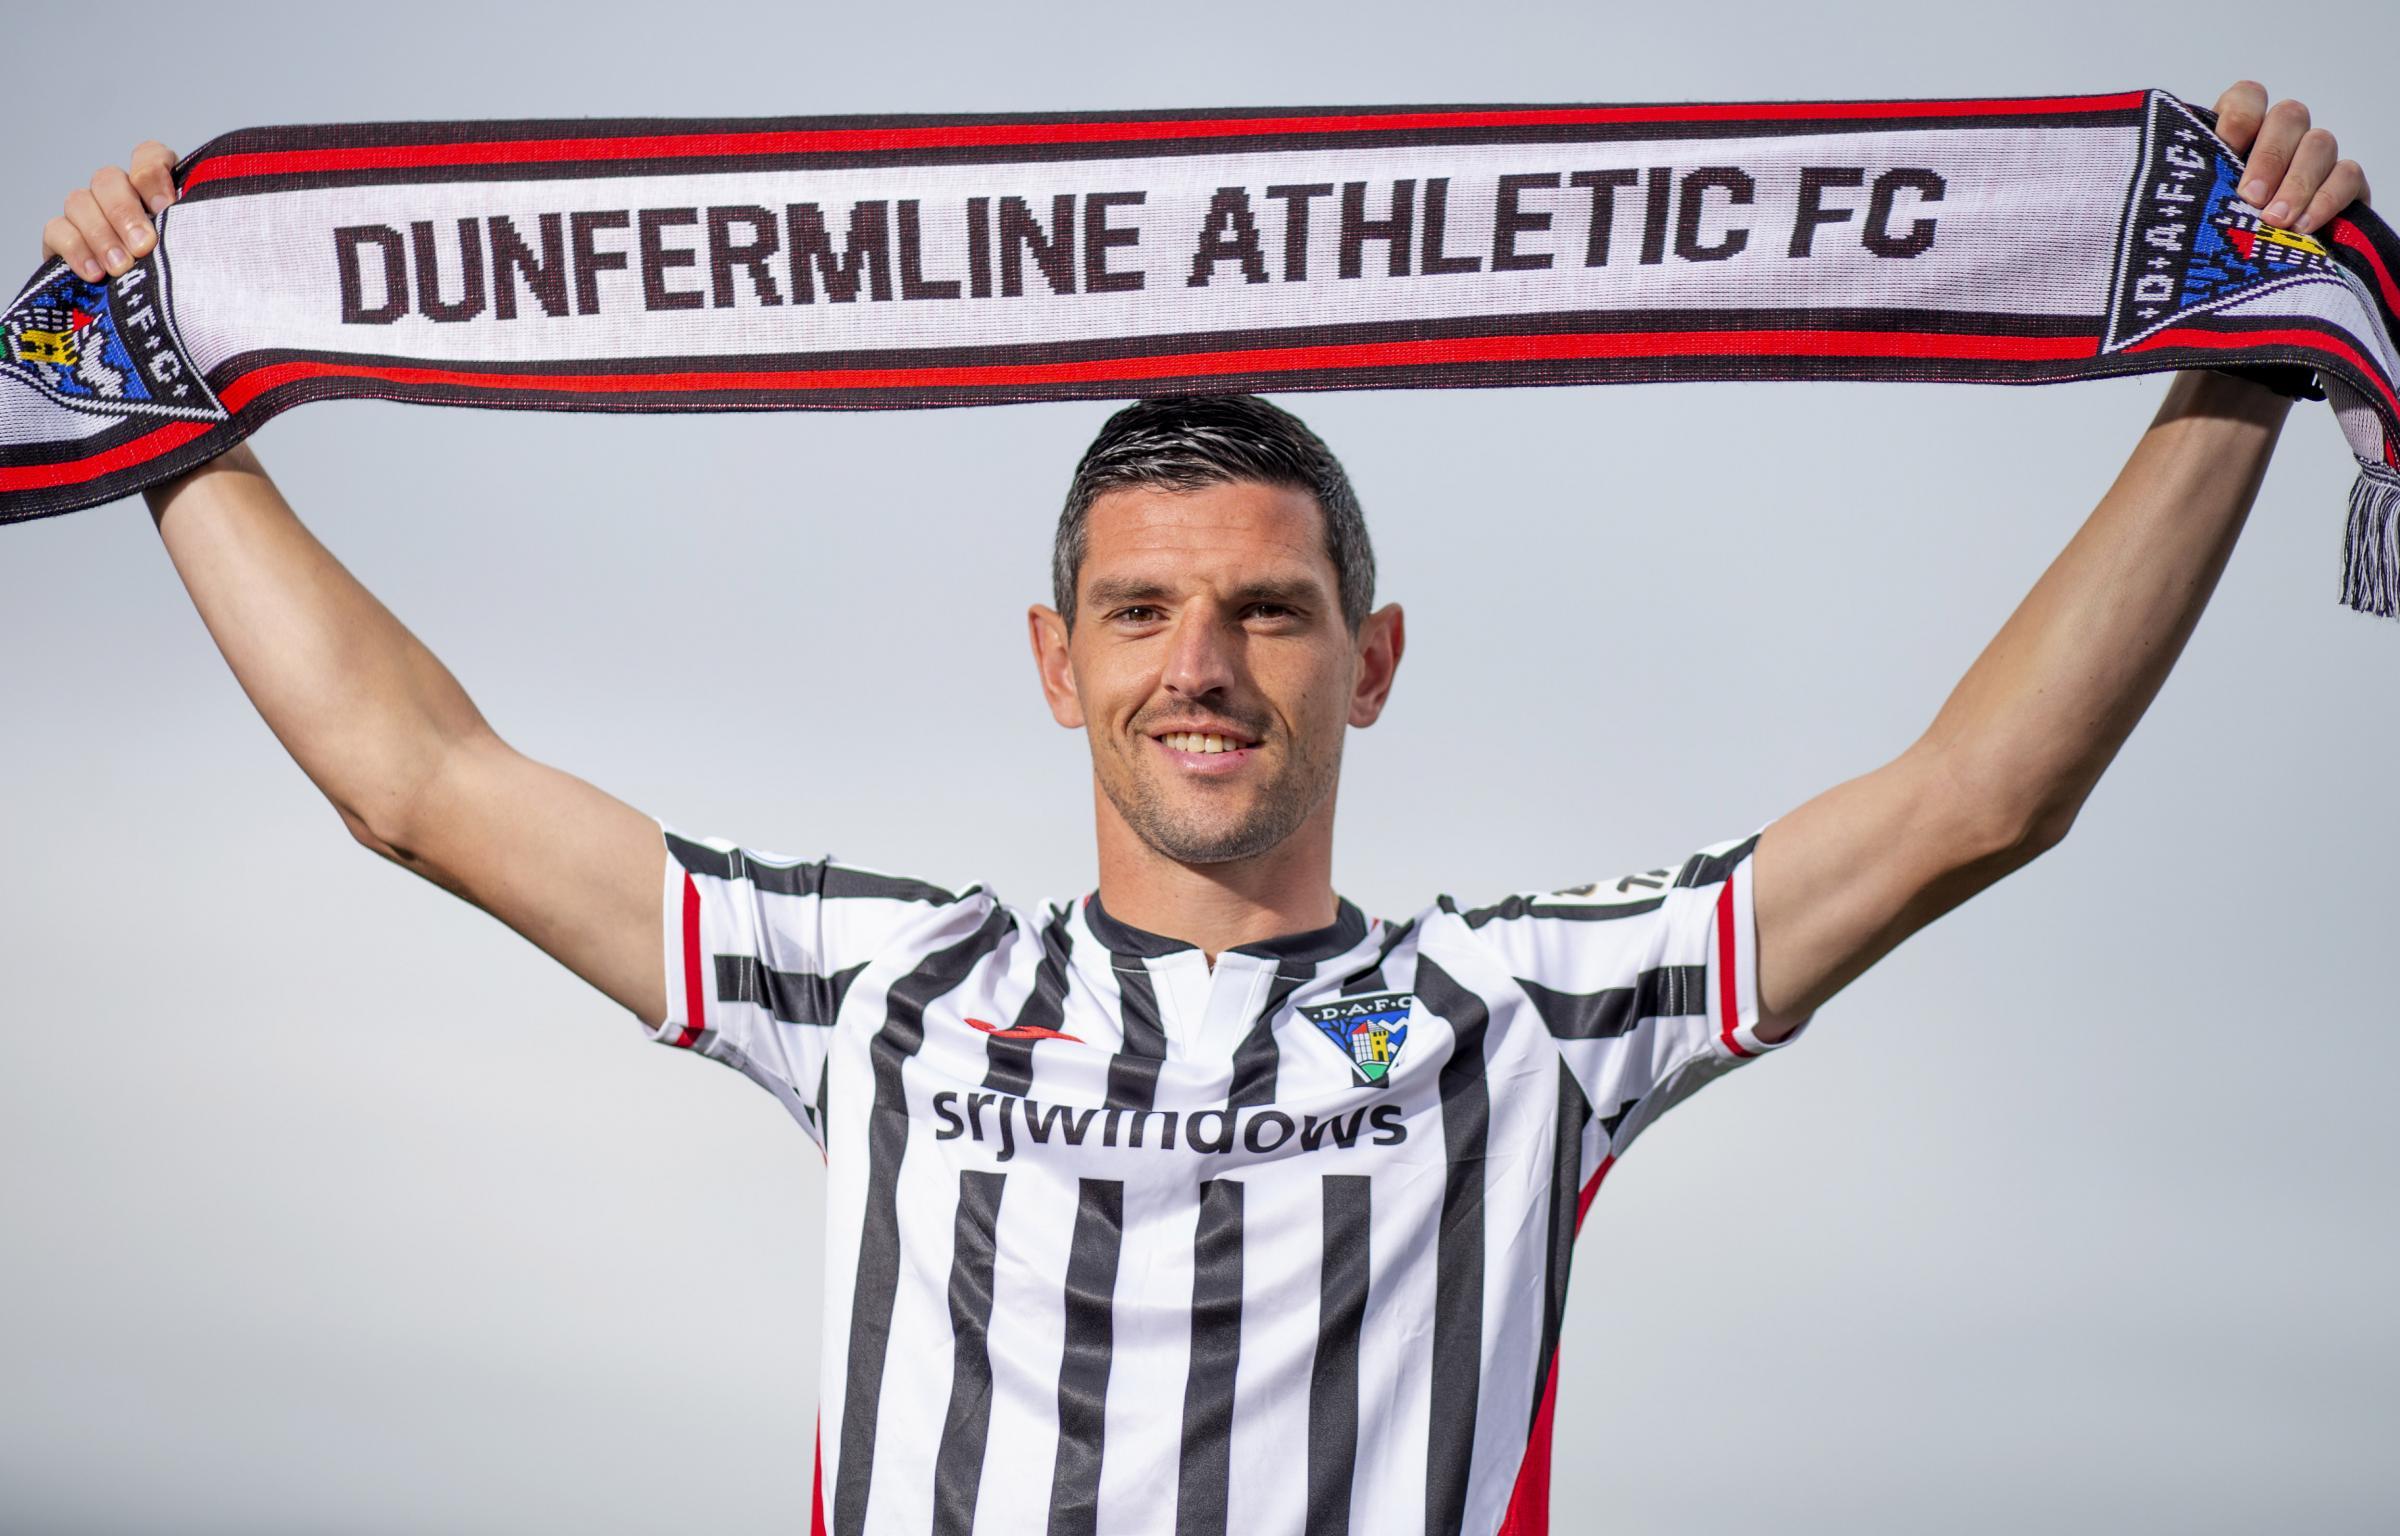 Dunfermline: Former Rangers midfielder Graham Dorrans signs